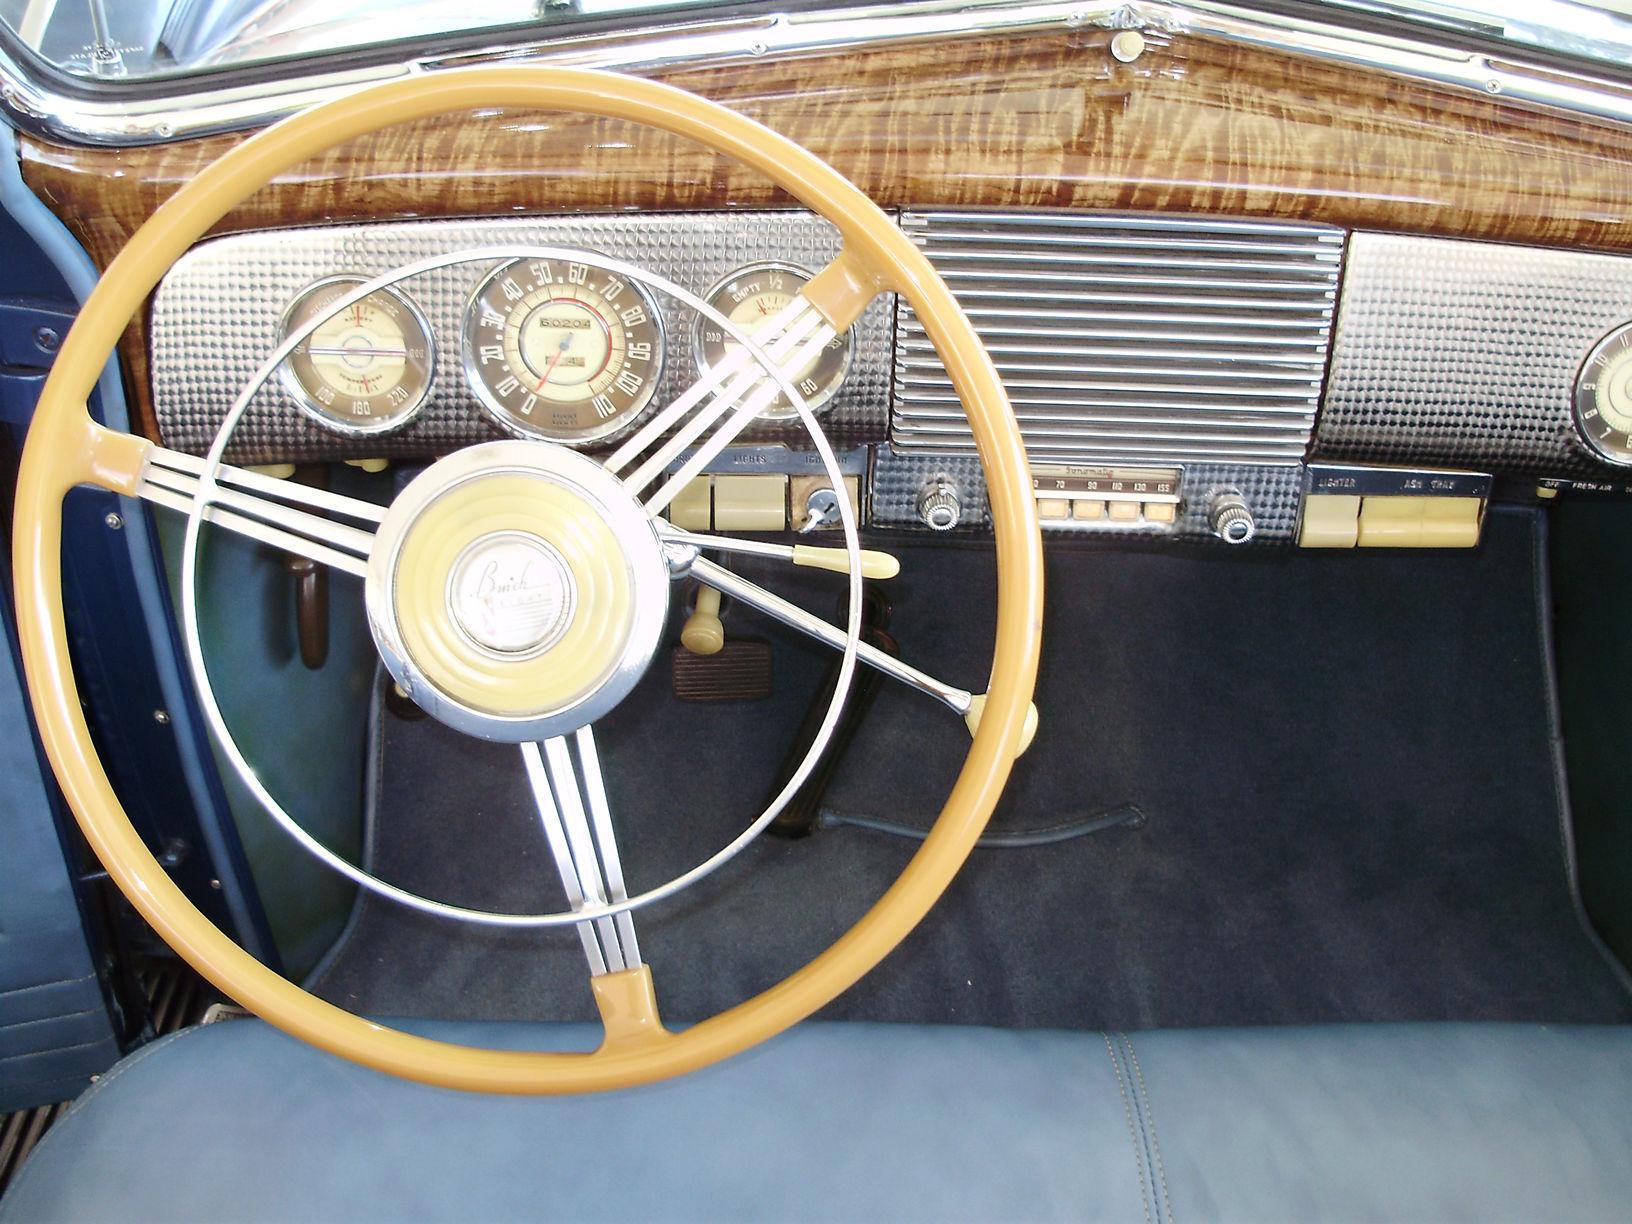 1940 BUICK CENTURY CONVERTIBLE SEDAN - Vintage Motors of Sarasota Inc. #28